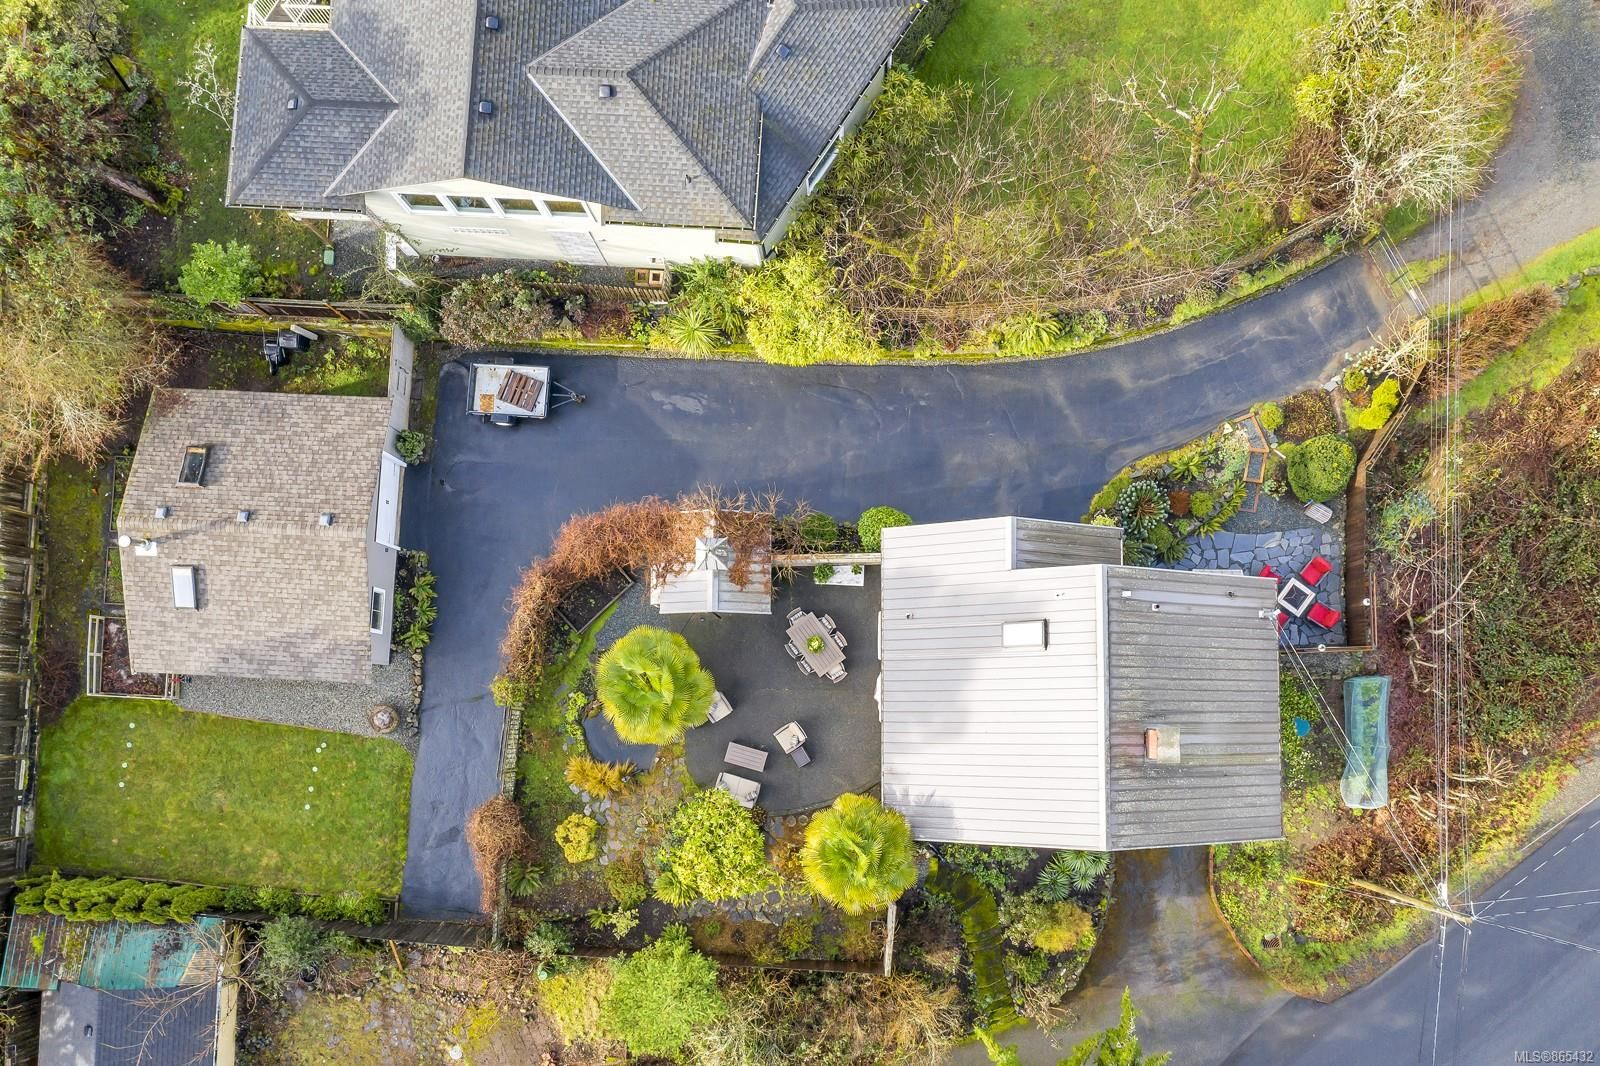 Photo 35: Photos: 6734 Drummond Dr in : Du East Duncan House for sale (Duncan)  : MLS®# 865432